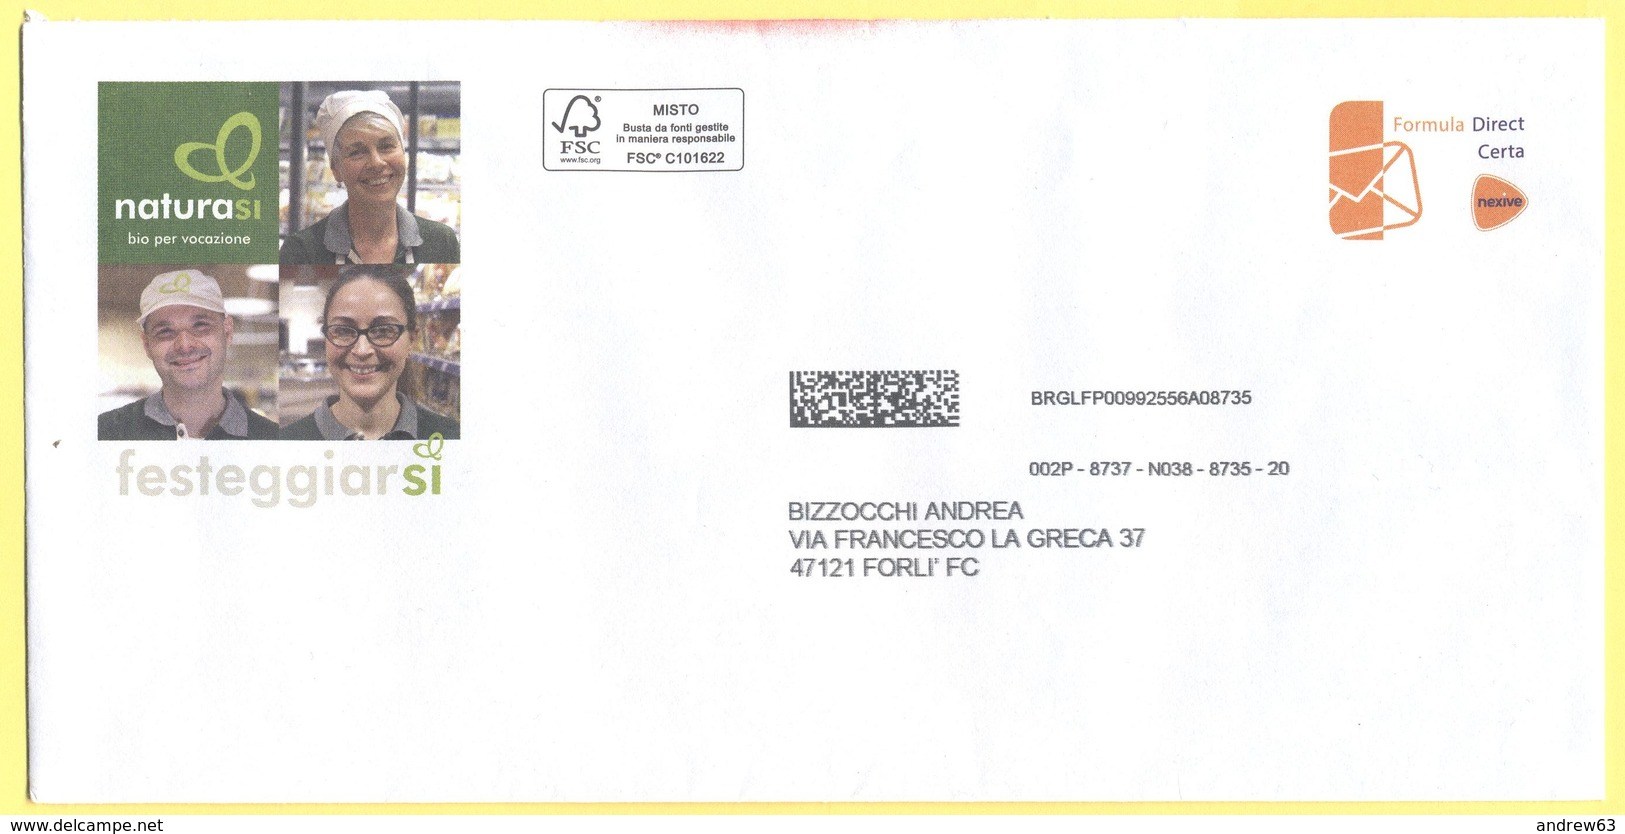 ITALIA - ITALY - ITALIE - 2019 - Formula Direct Certa Nexive - NaturaSì - Viaggiata Per Forlì - 2011-...: Storia Postale